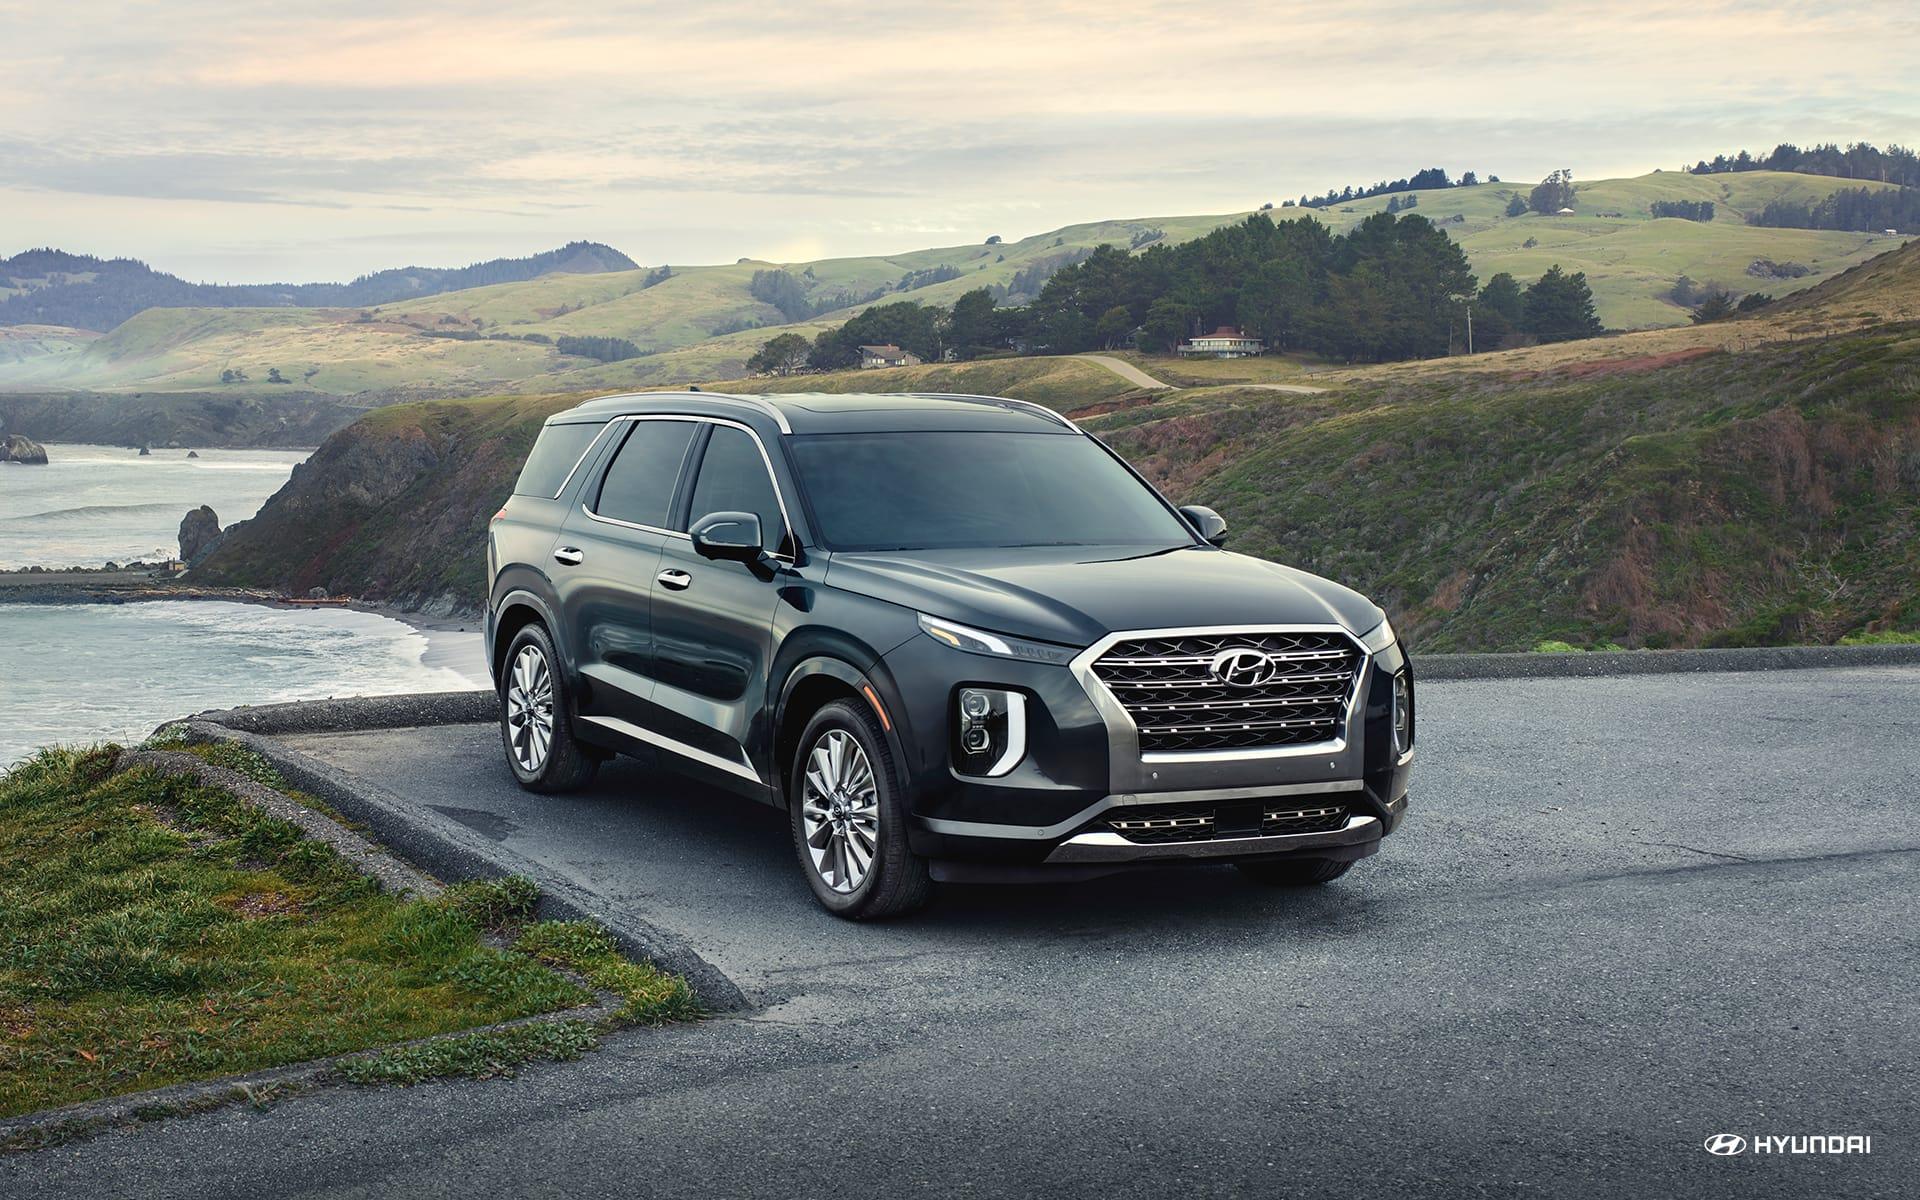 Buy, Lease, or Finance the 2020 Hyundai Palisade near Charlotte NC